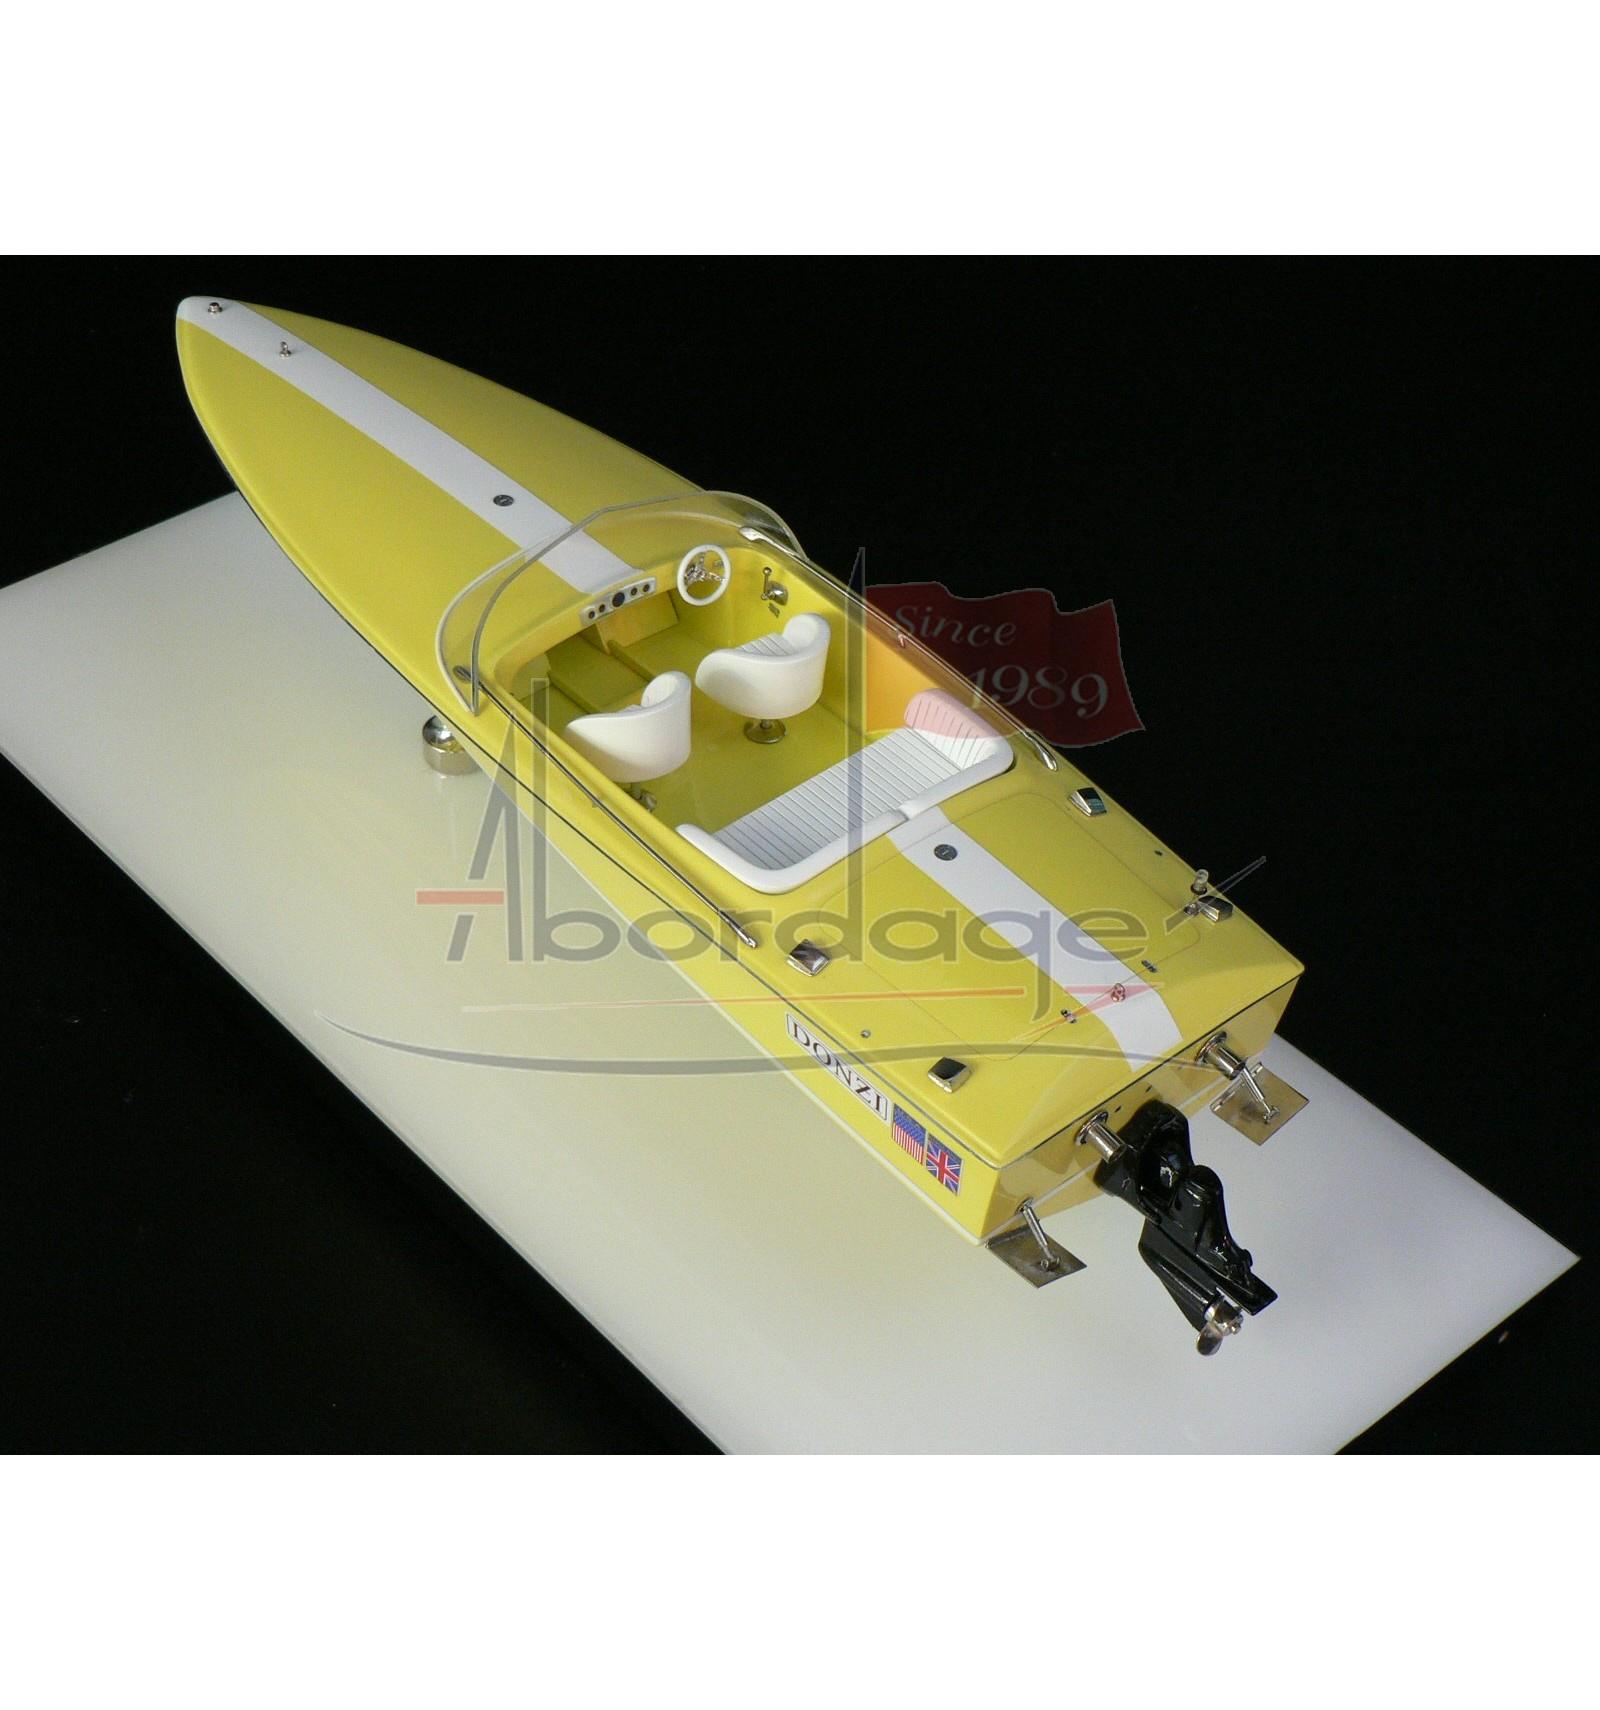 donzi 18 model boat